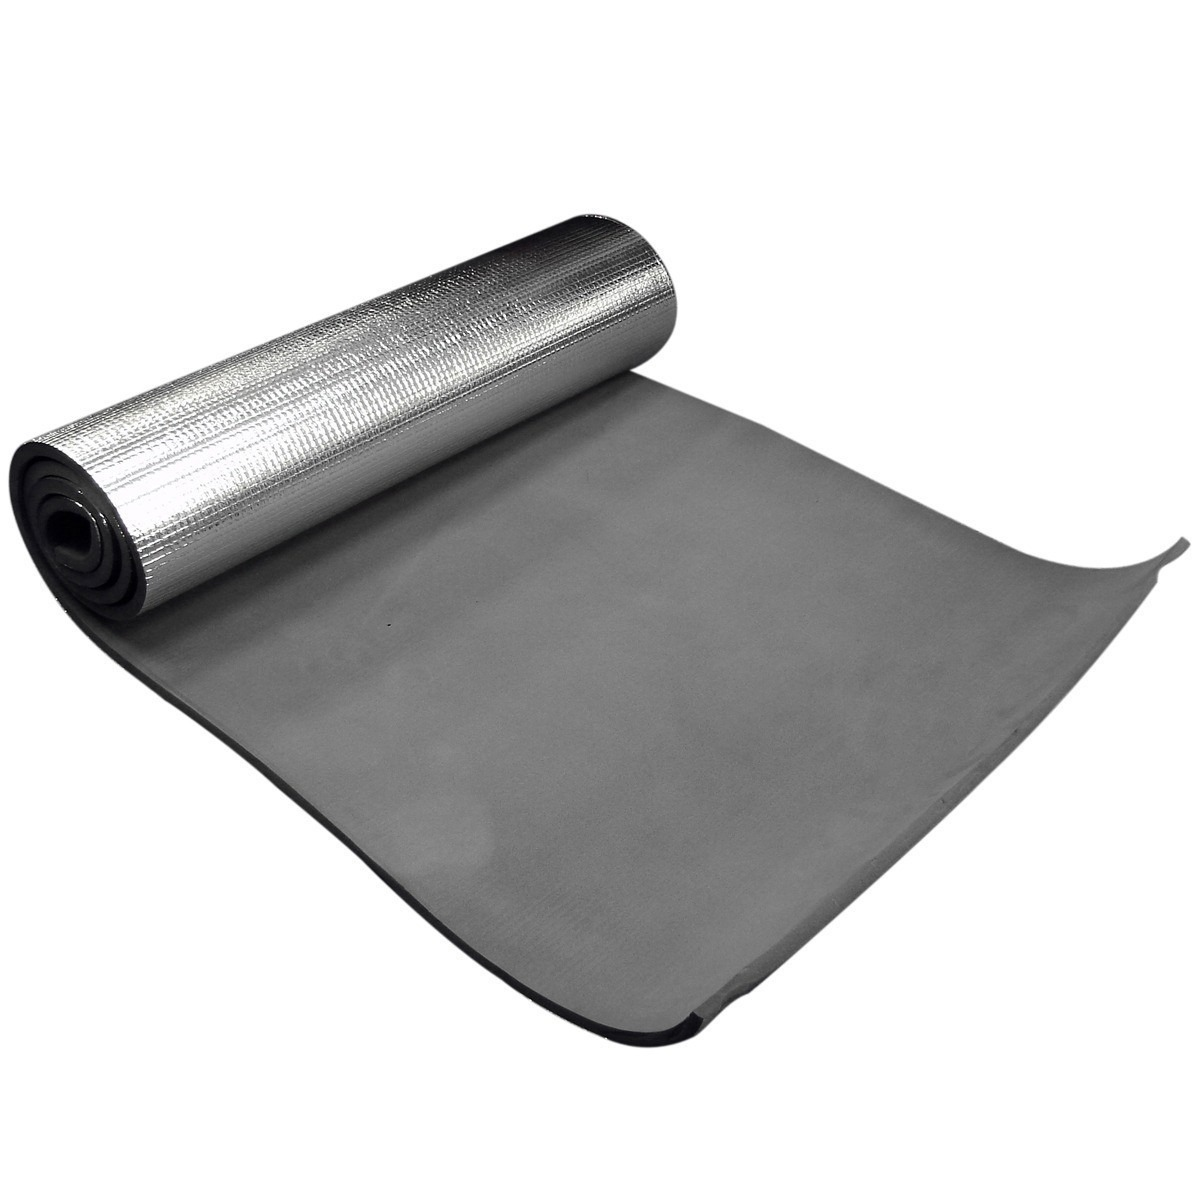 Isolante t rmico nautika eva aluminizado r 54 89 em for Isolante termico bricoman